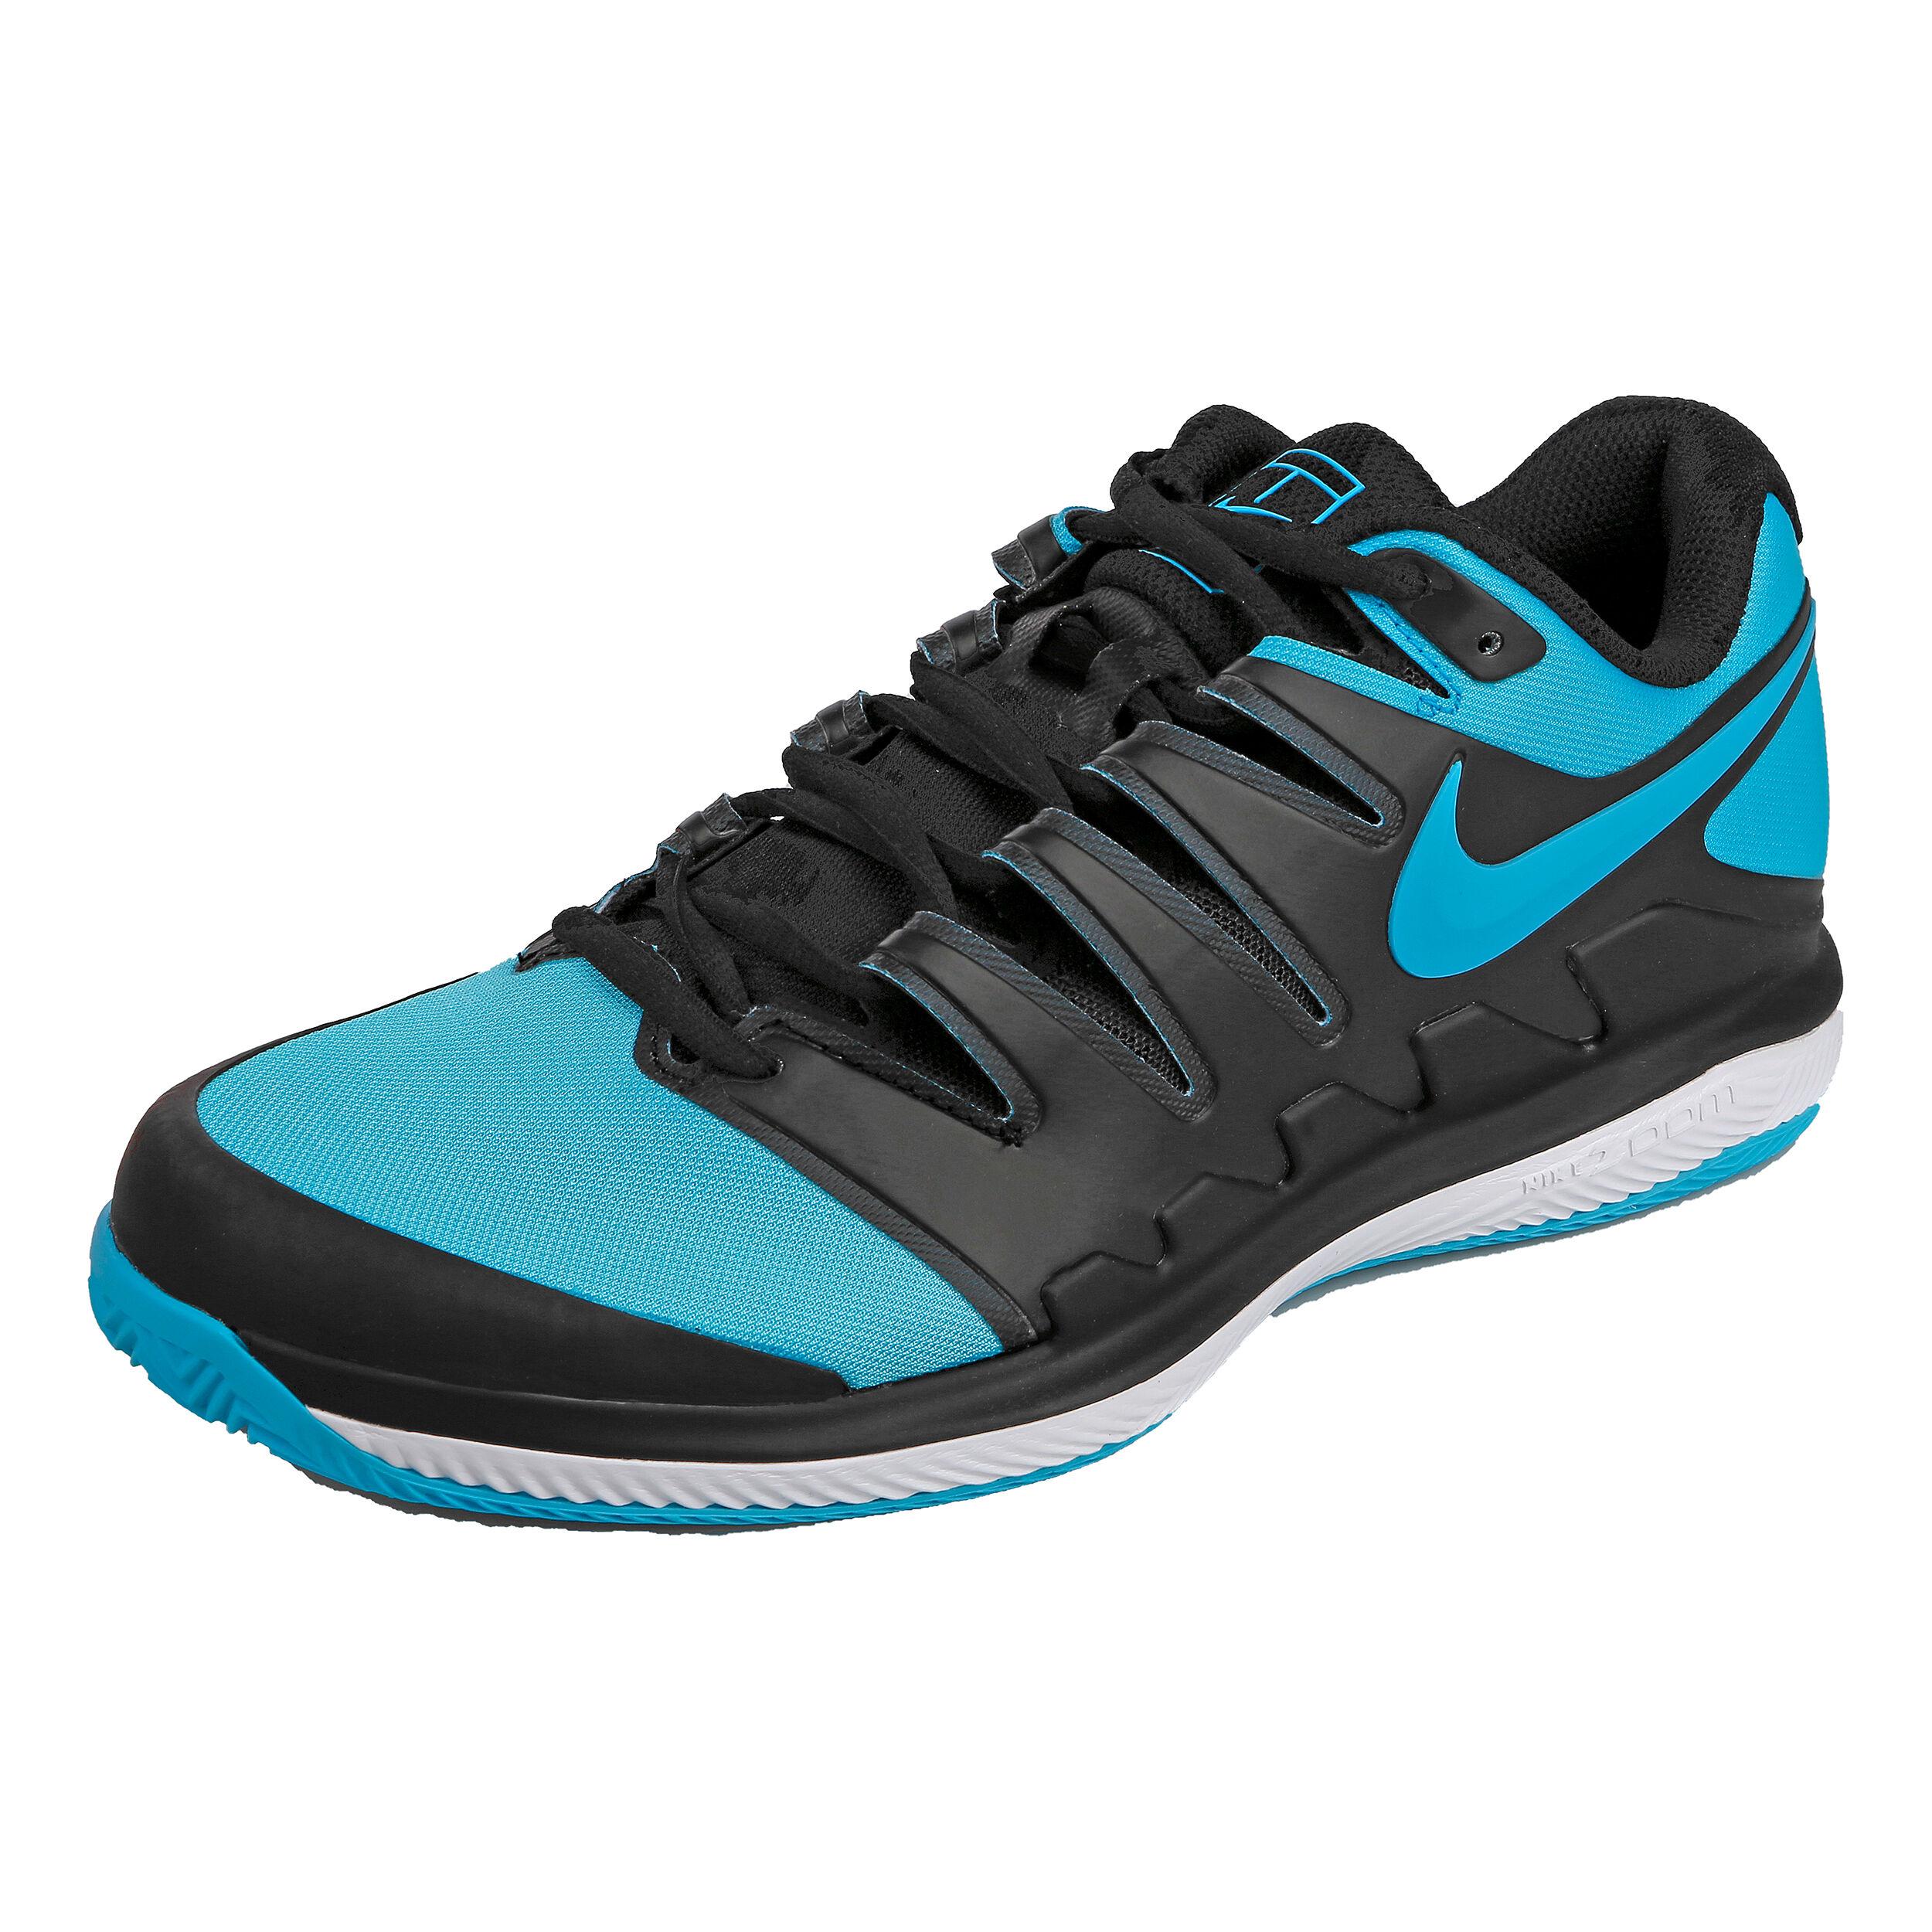 Nike Air Zoom Vapor X Clay Scarpa Per Terra Rossa Uomini Nero, Blu